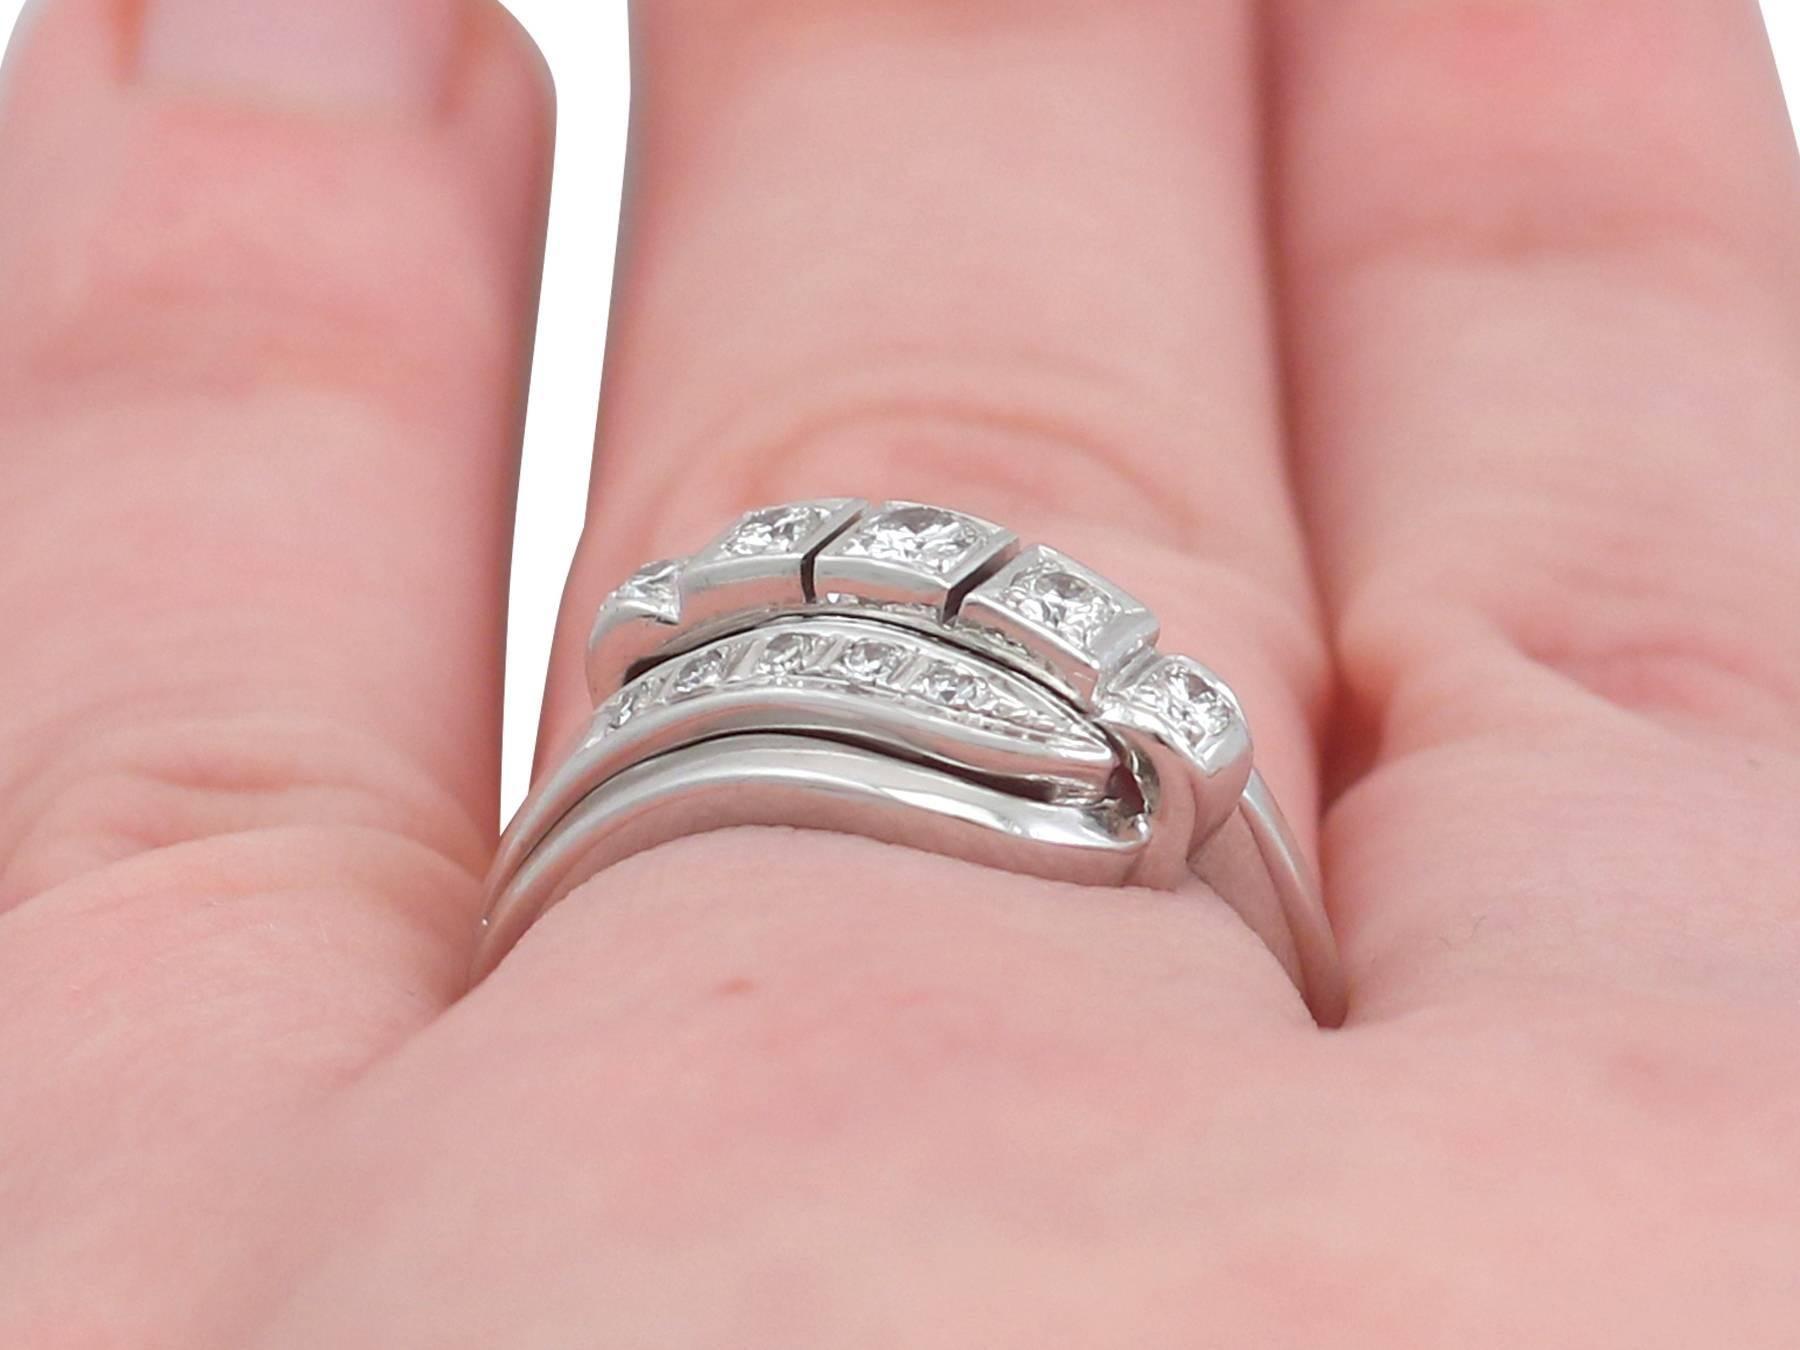 1950s Diamond and 14 Karat White Gold Dress Ring For Sale at 1stdibs